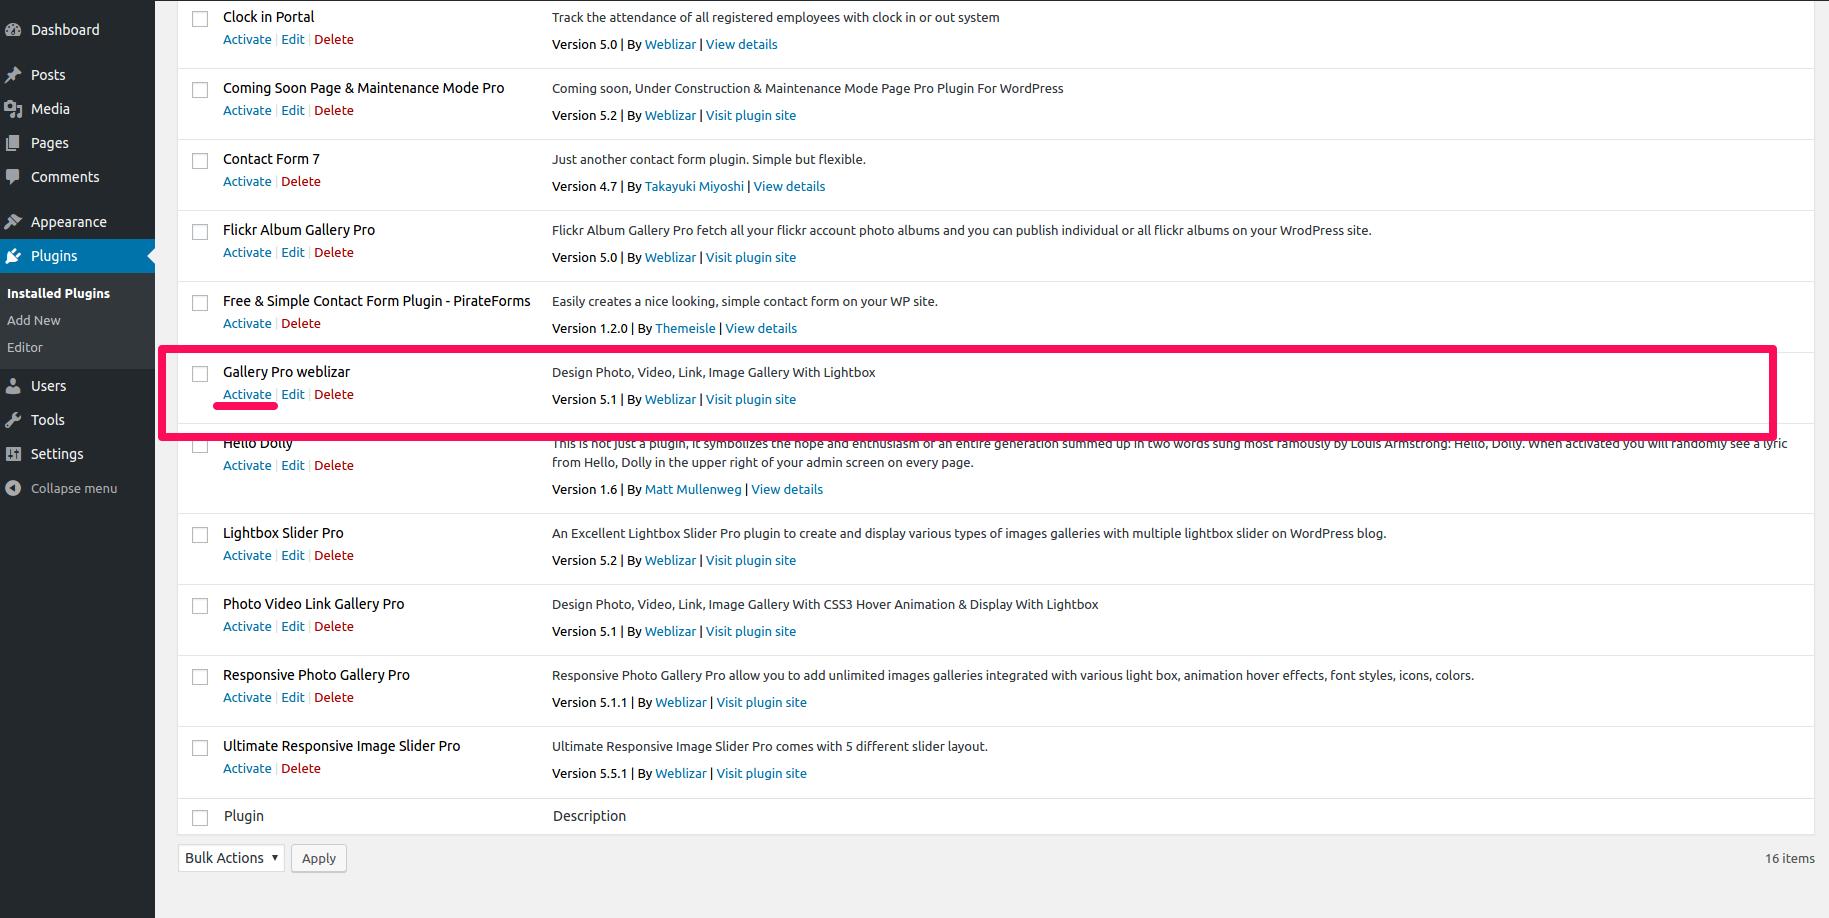 Gallery Pro | Weblizar Themes & Plugins Documentation